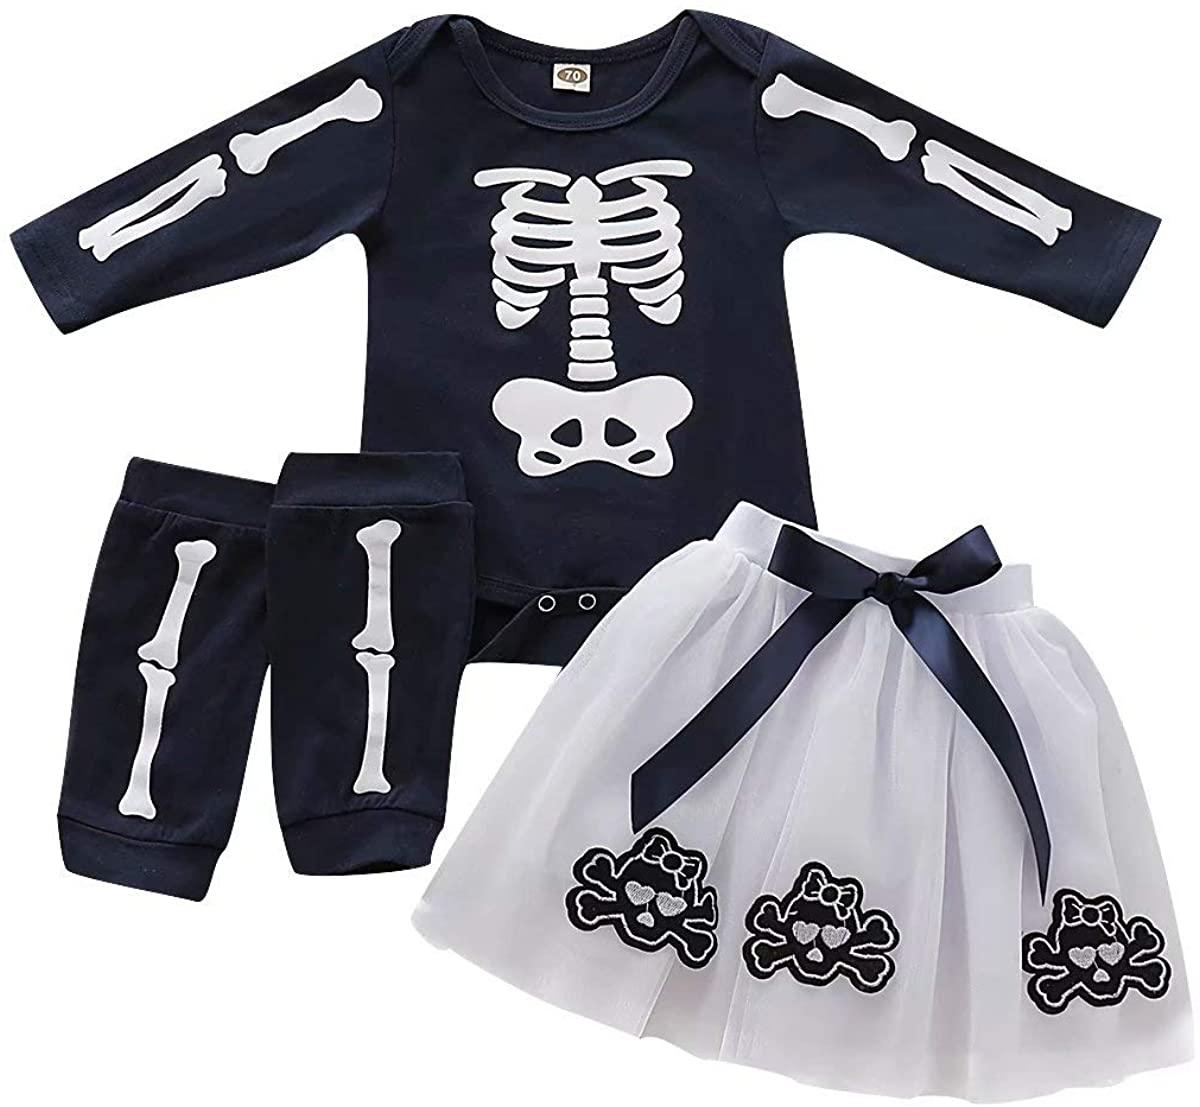 Jobakids Baby Girls Long Sleeve Halloween Shirt and Skirt Set Skull Tutu Sets Chiffon Dress with Leg Warmer(Dark Blue,18Month)